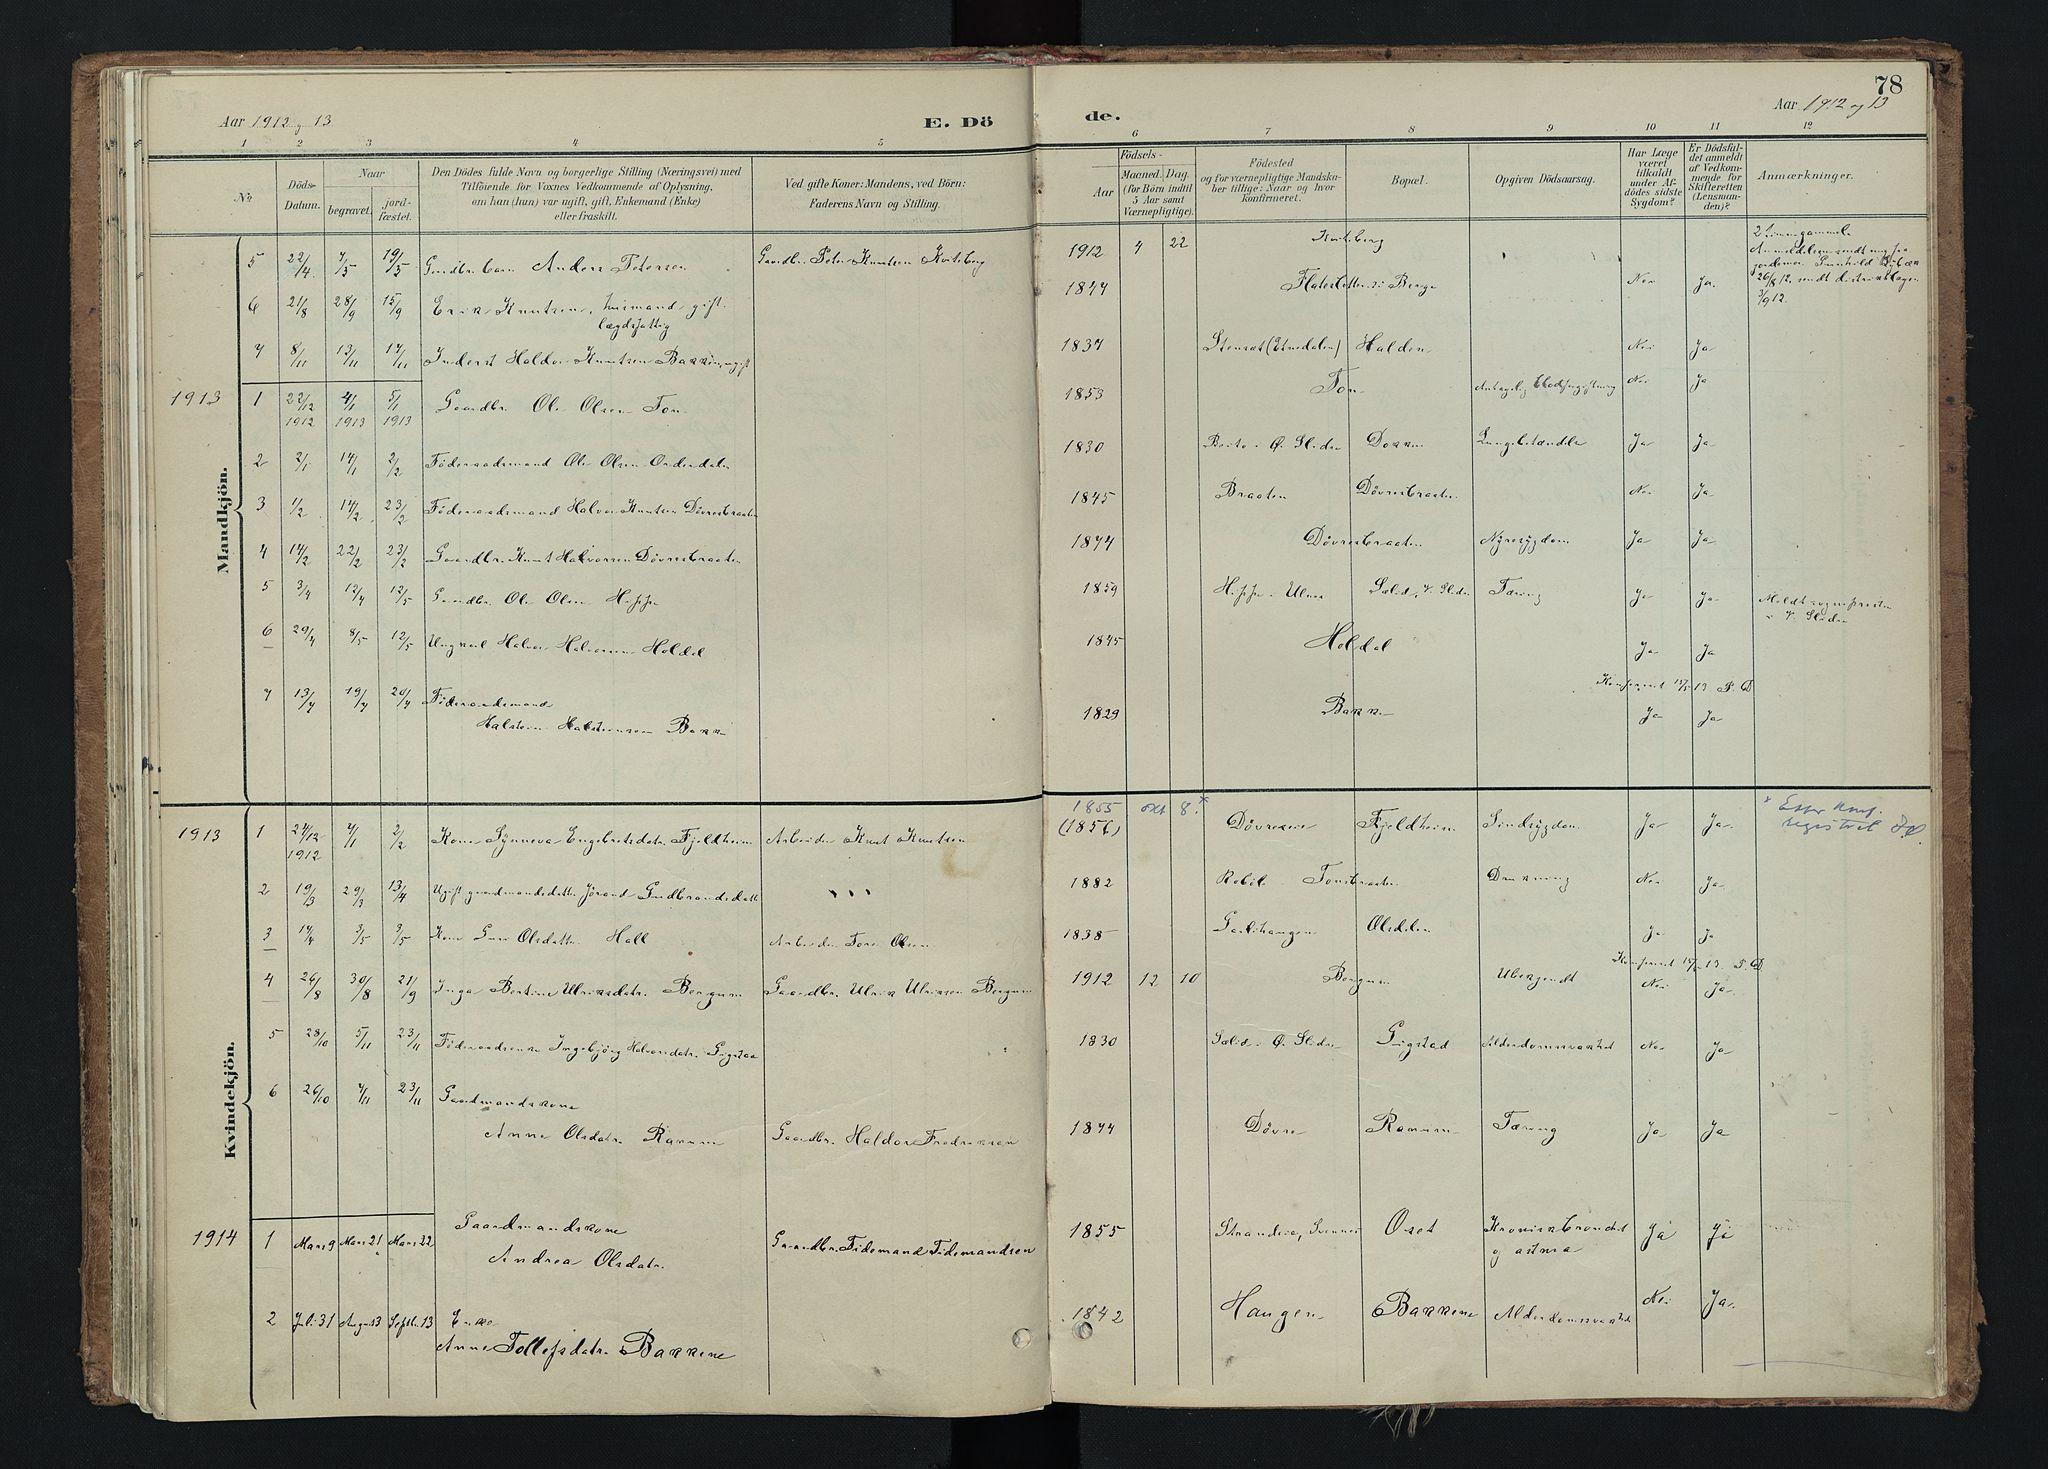 SAH, Nord-Aurdal prestekontor, Ministerialbok nr. 15, 1896-1914, s. 78